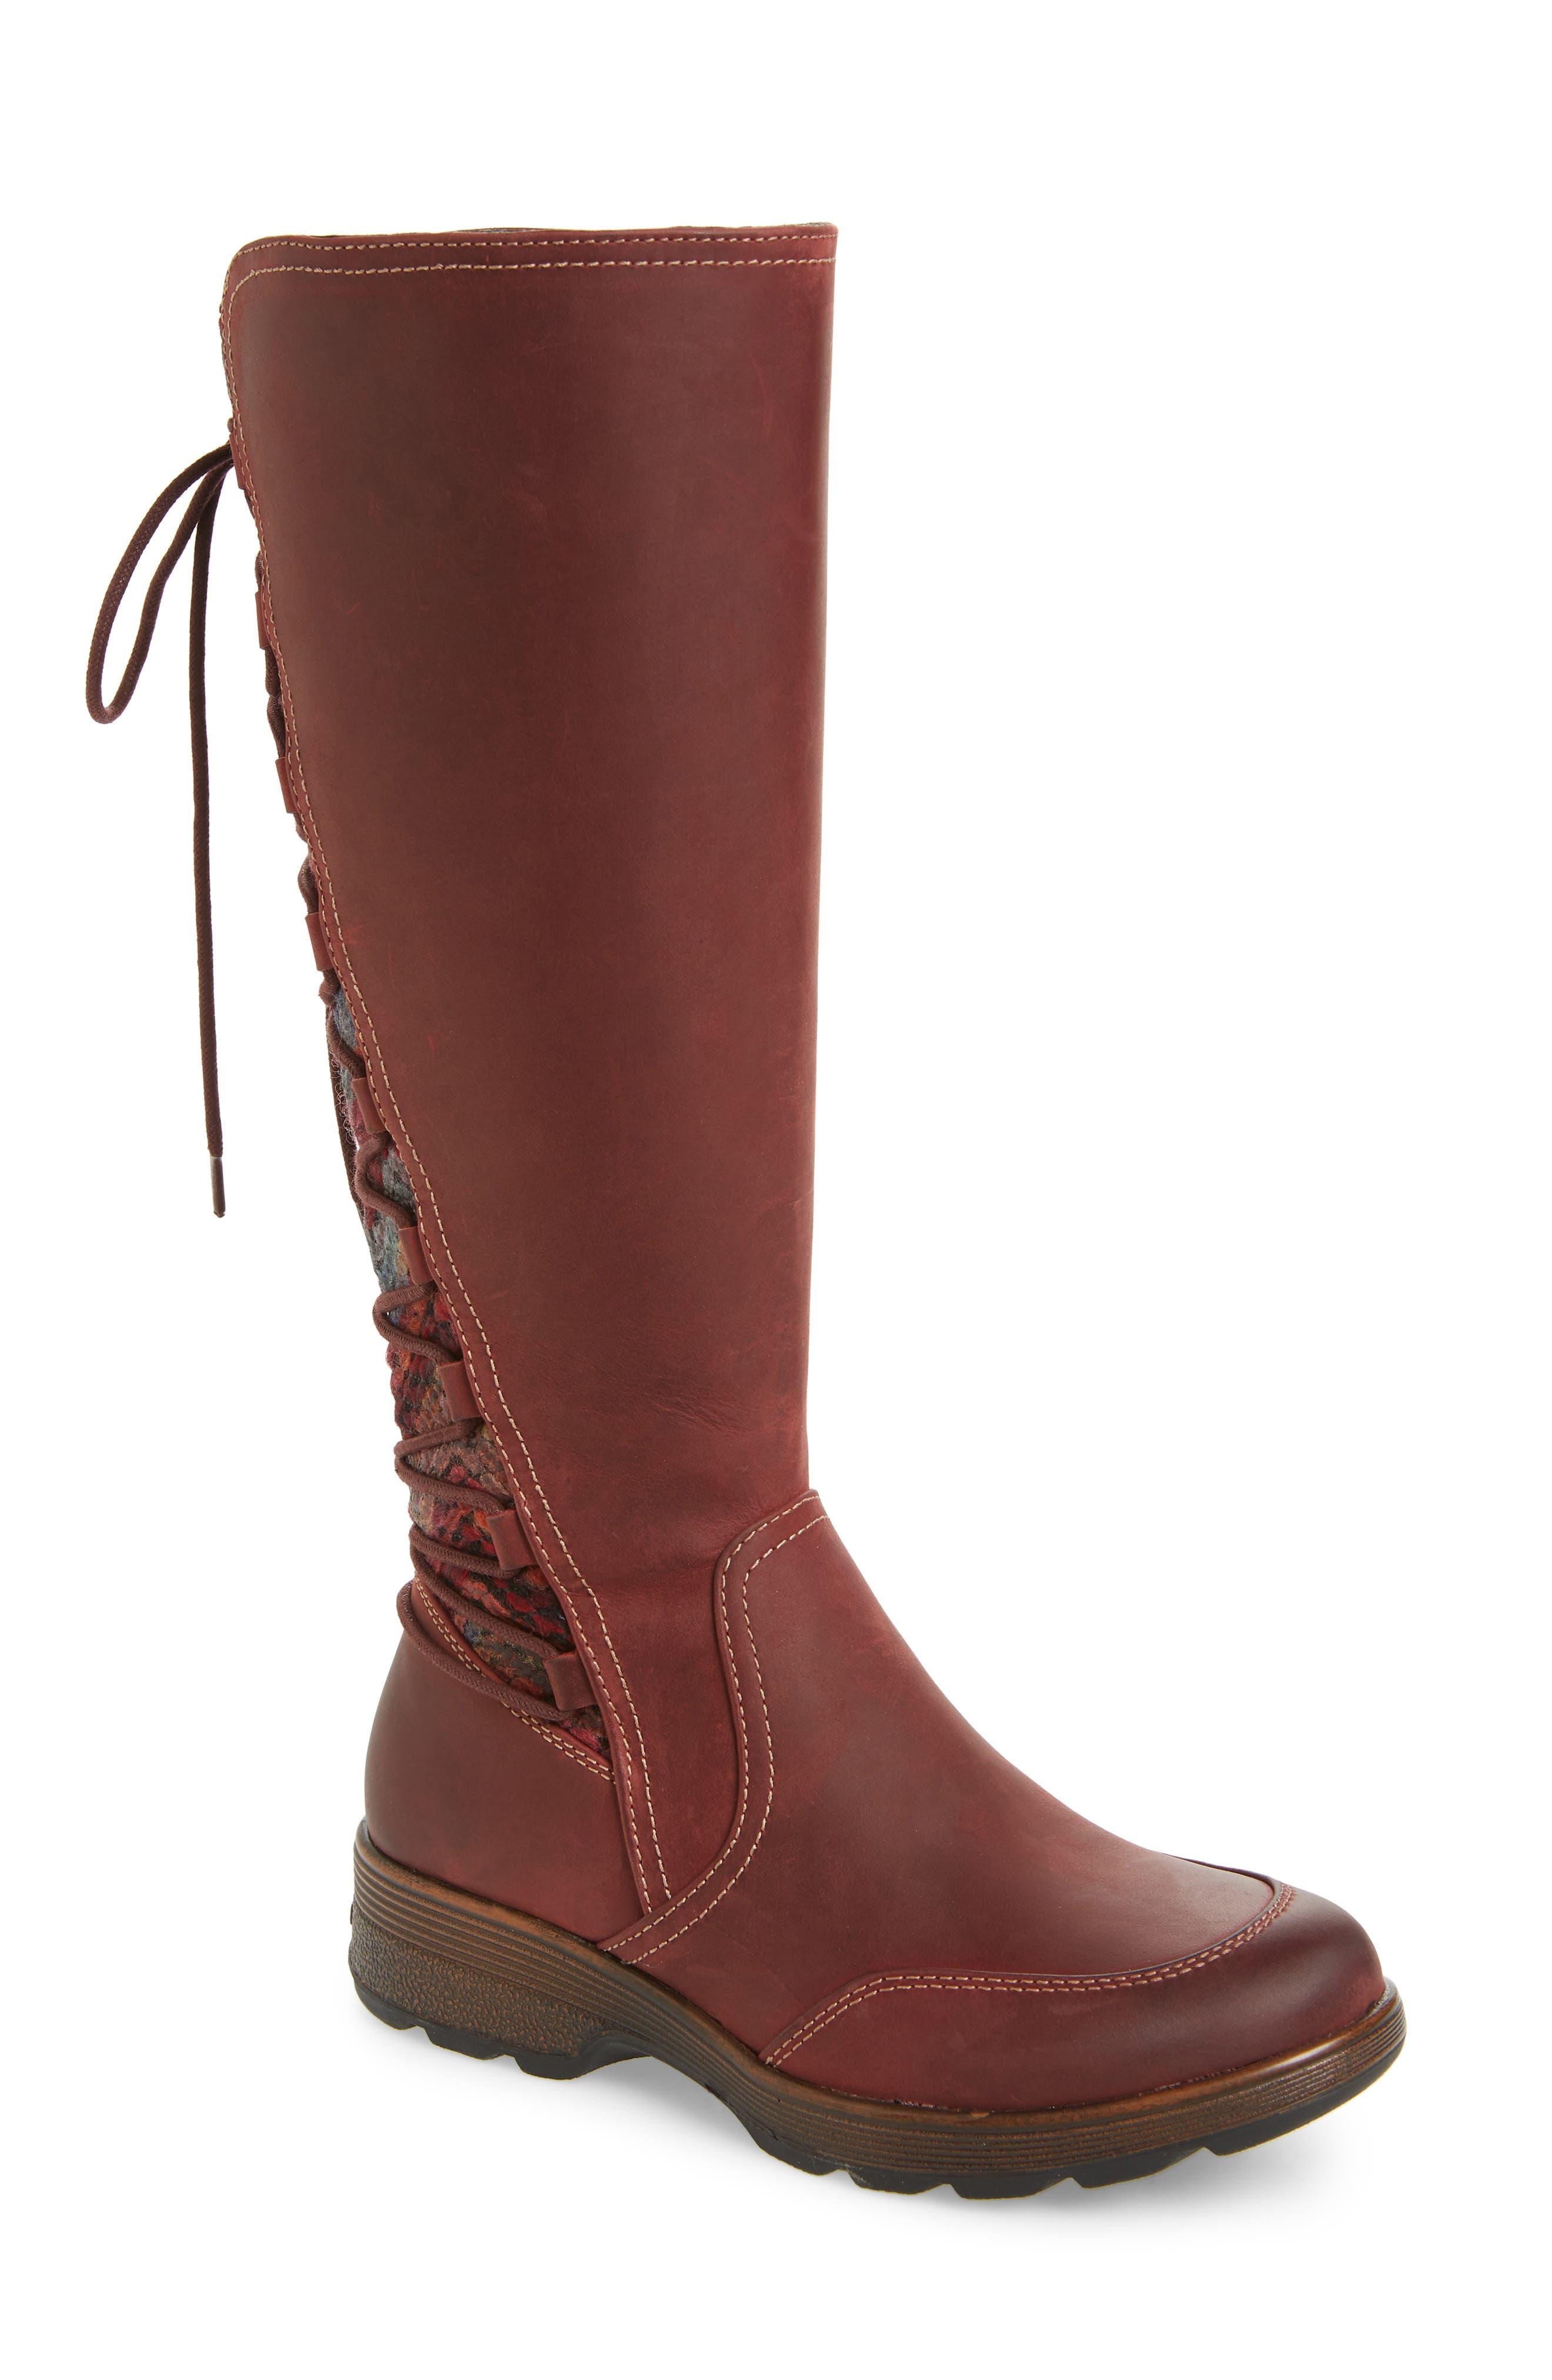 Bionica Epping Waterproof Knee High Boot, Burgundy